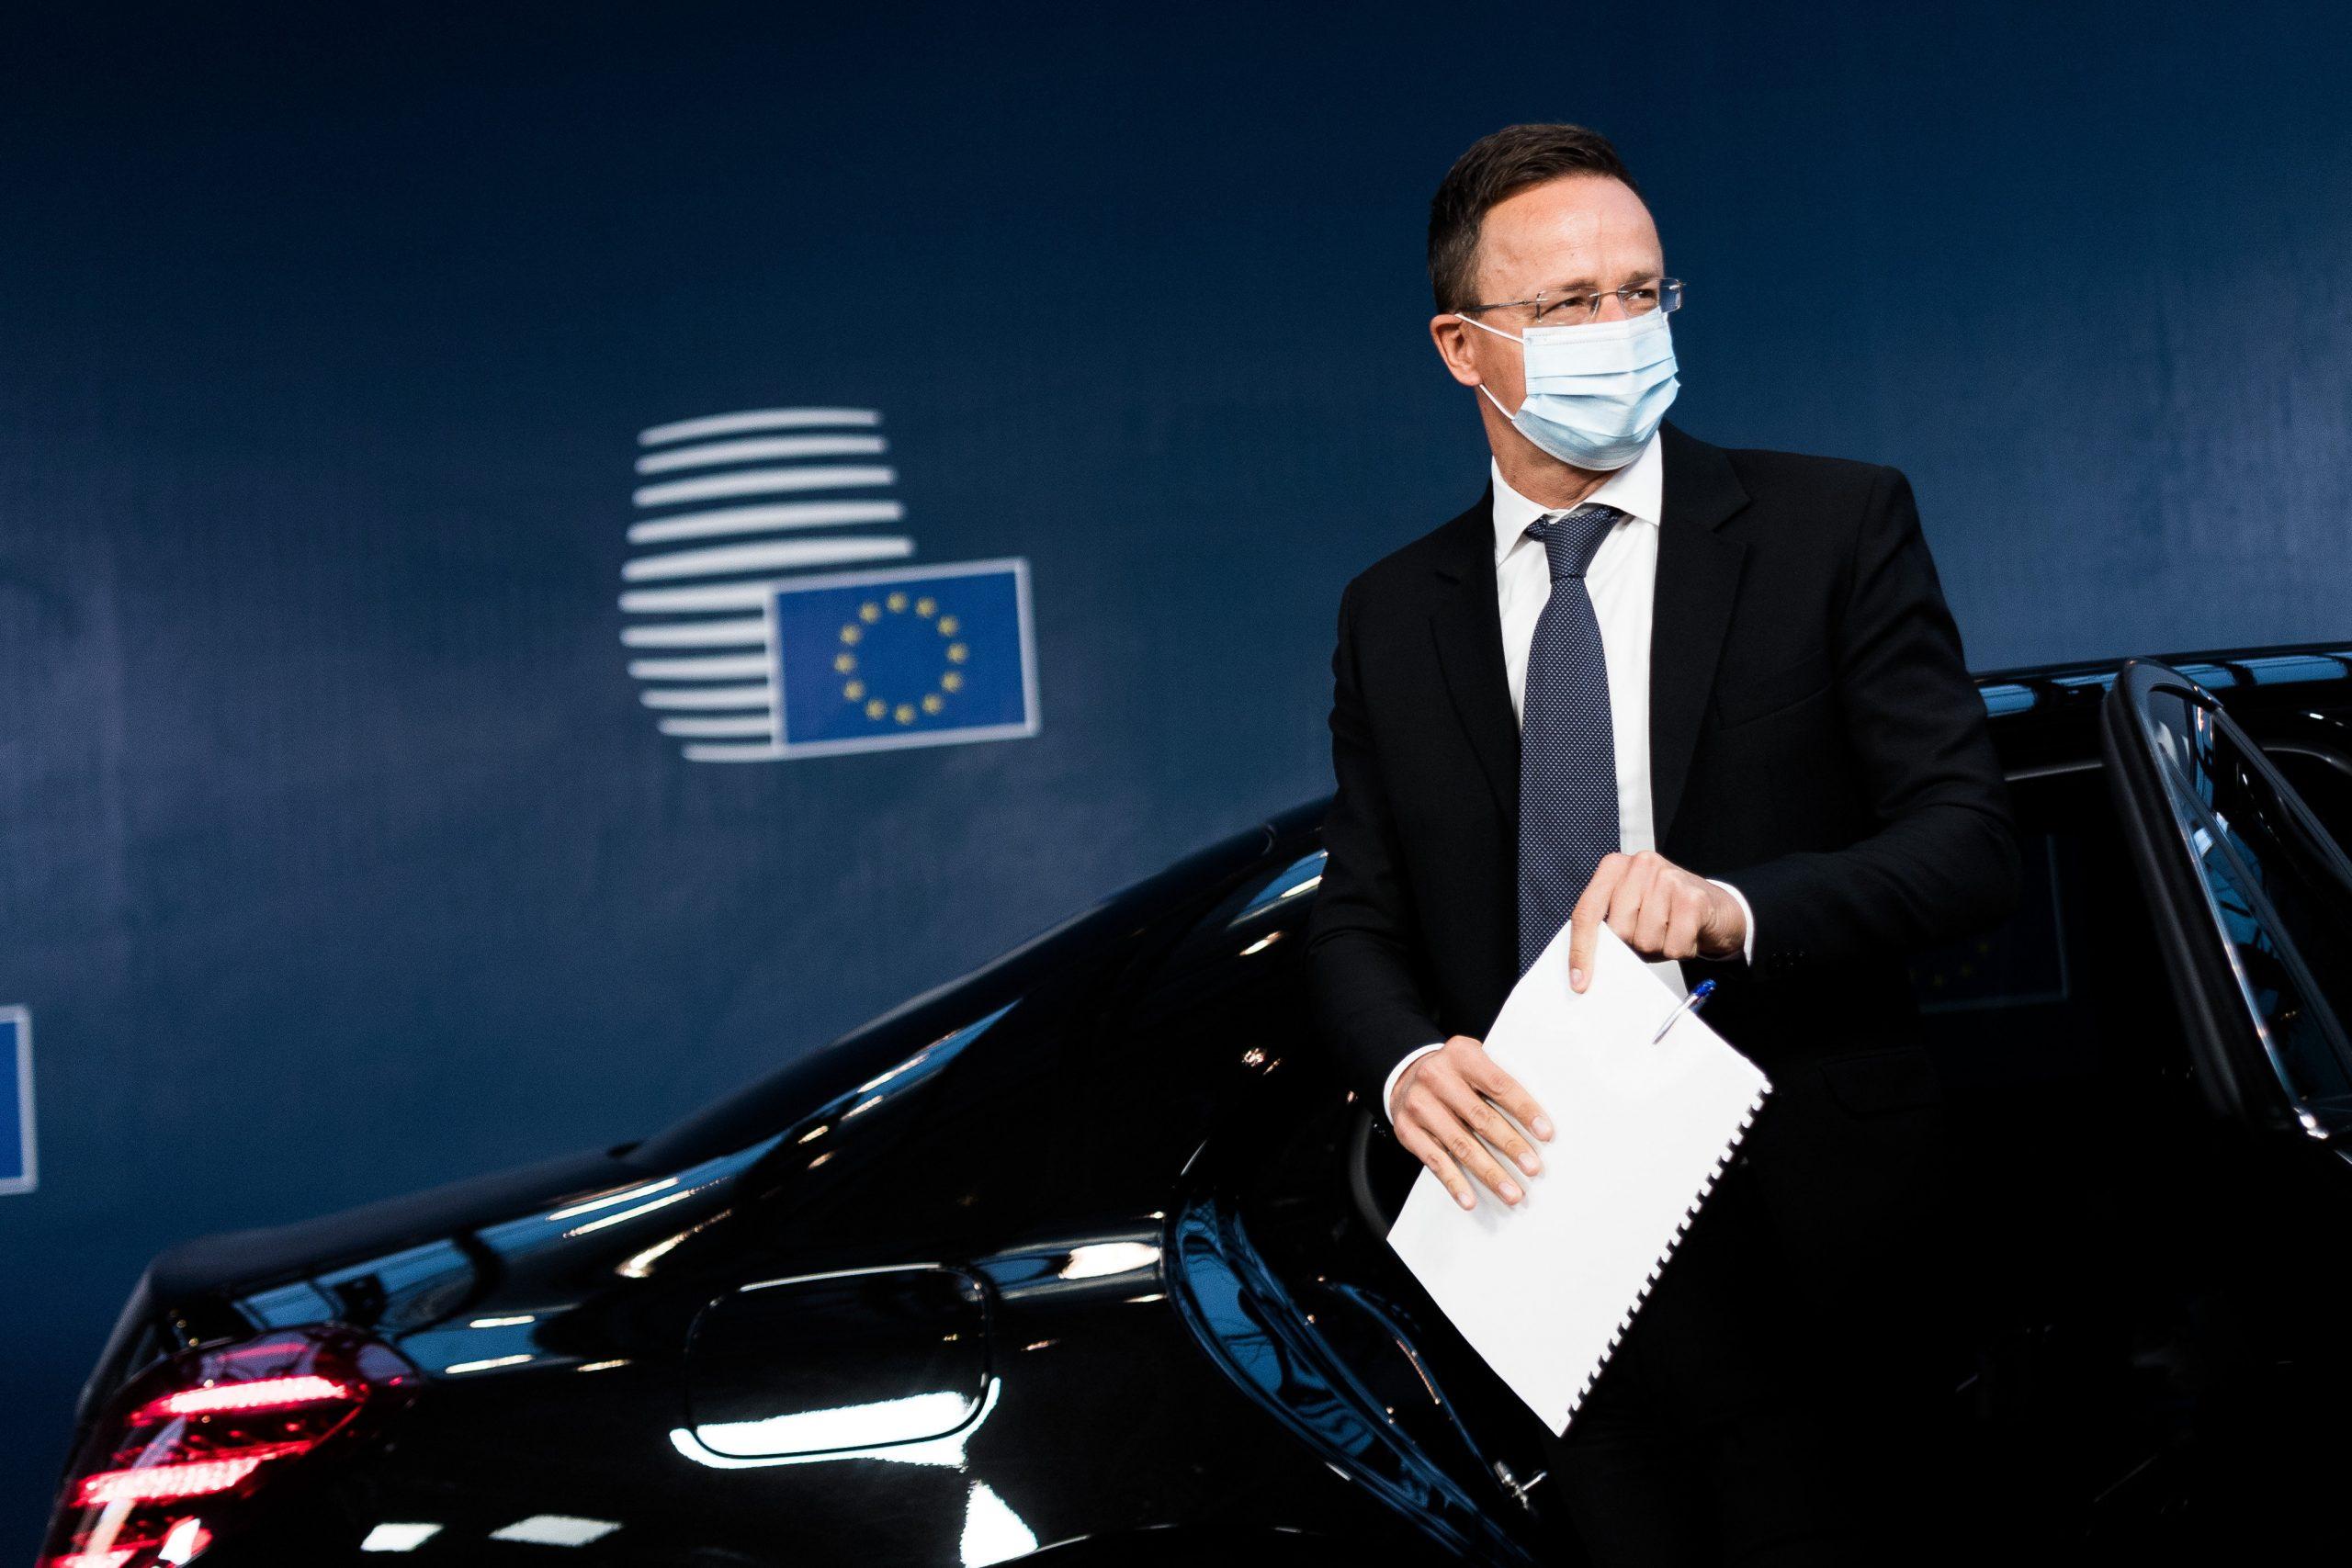 Coronavirus: FM Szijjártó Calls on EU to Create Jobs for European Citizens